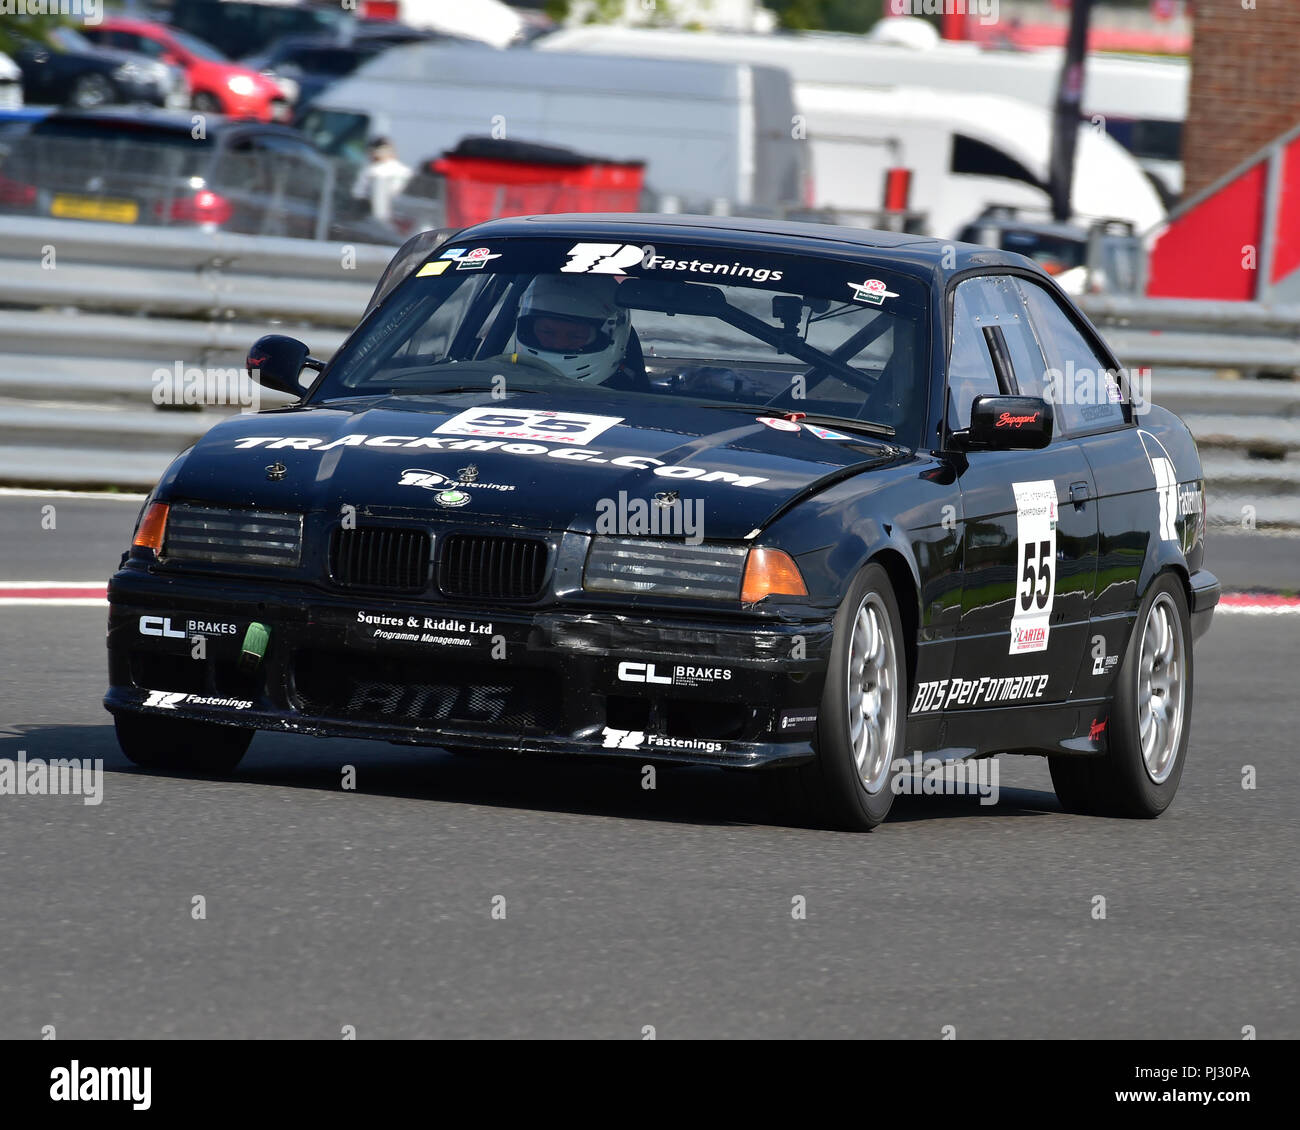 Laurence Squires Bmw 323i Amoc Intermarque Championship Aston